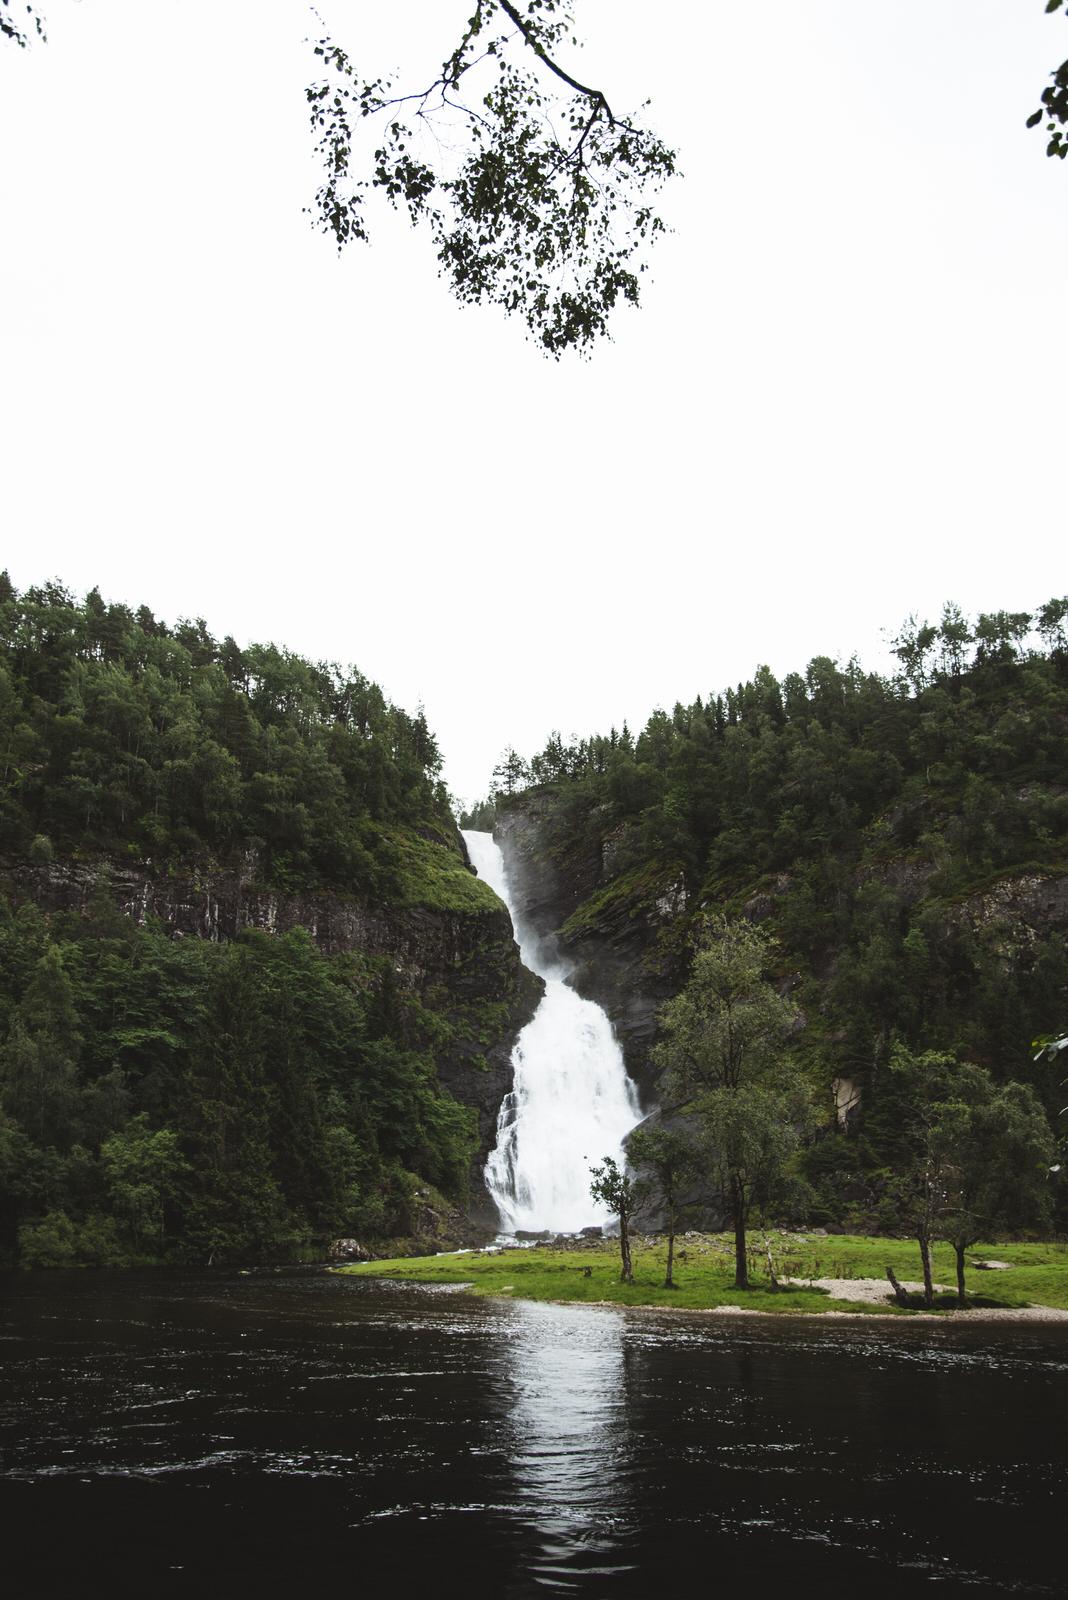 norway 2016 road trip day 4 sognefjorden boyabreen brikdalsbreen